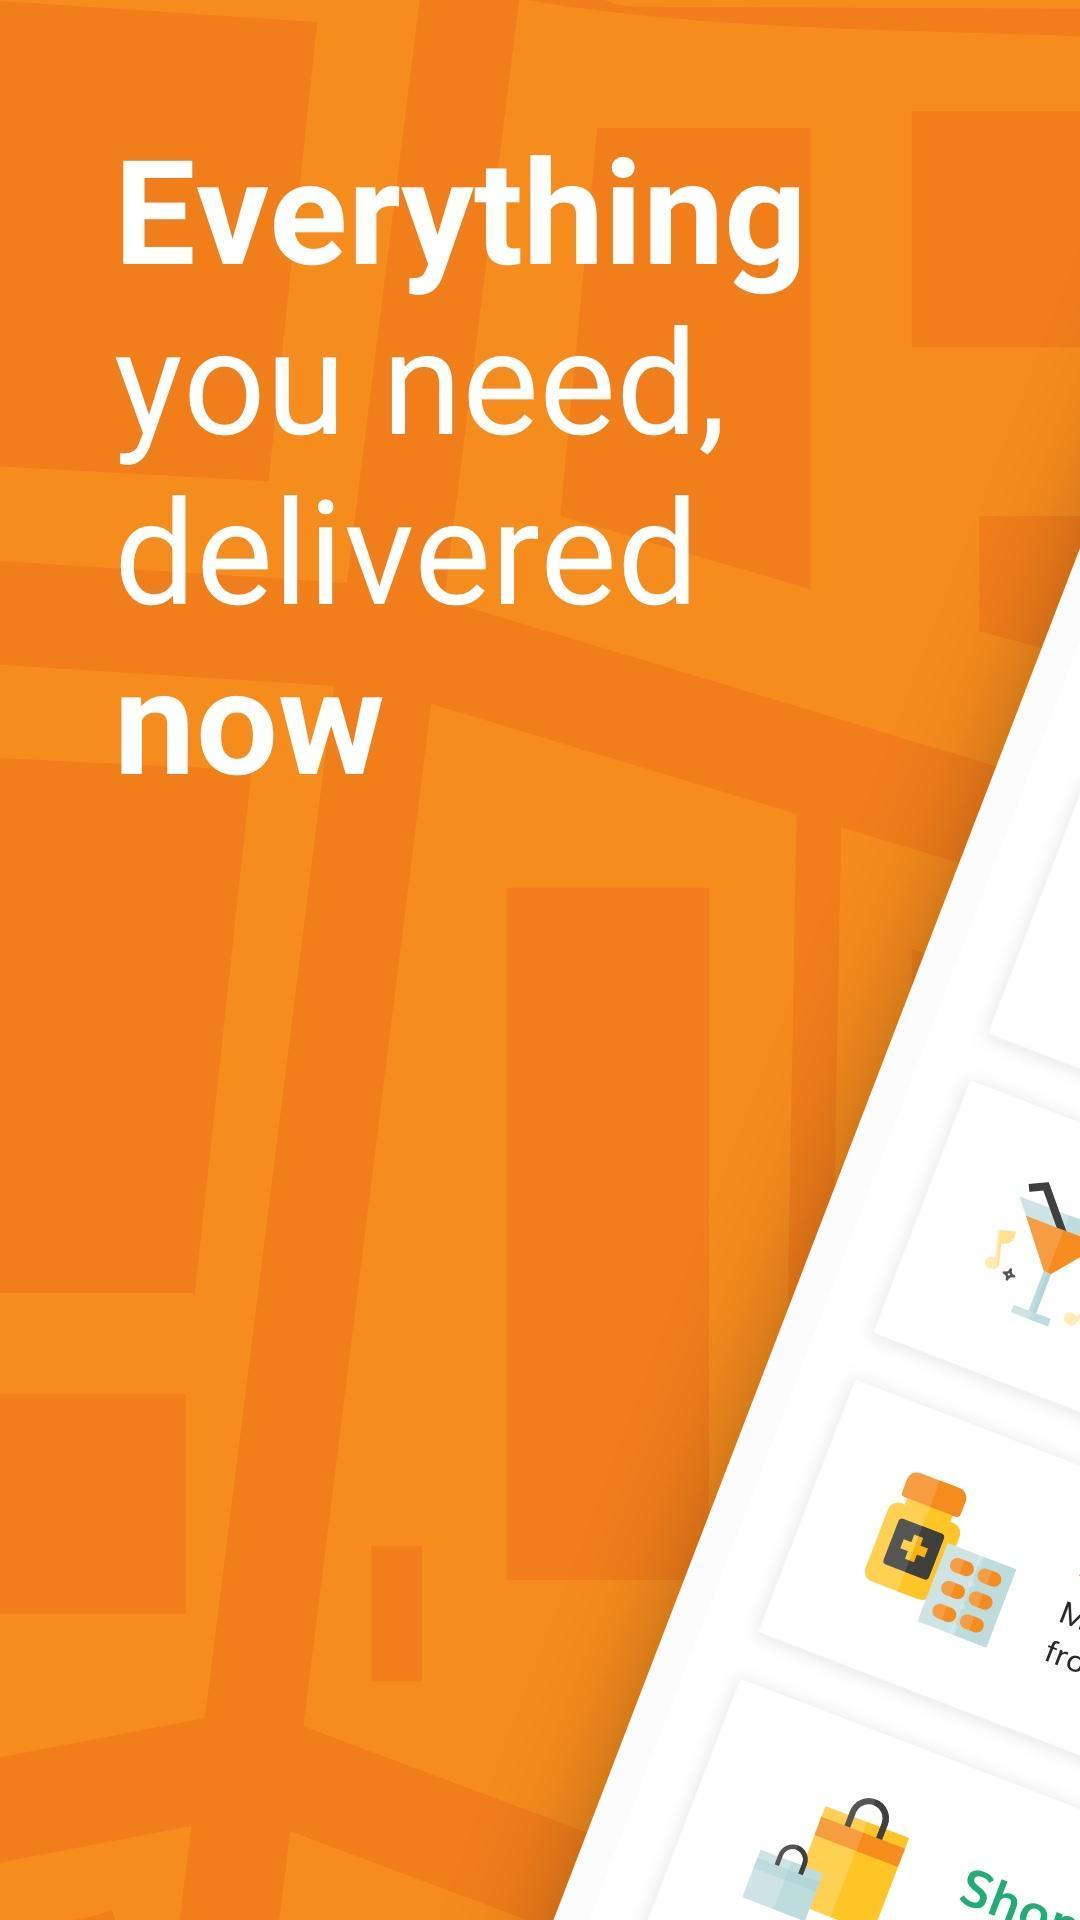 Jumia Food Local Food Delivery near You 4.3.1 Screenshot 1